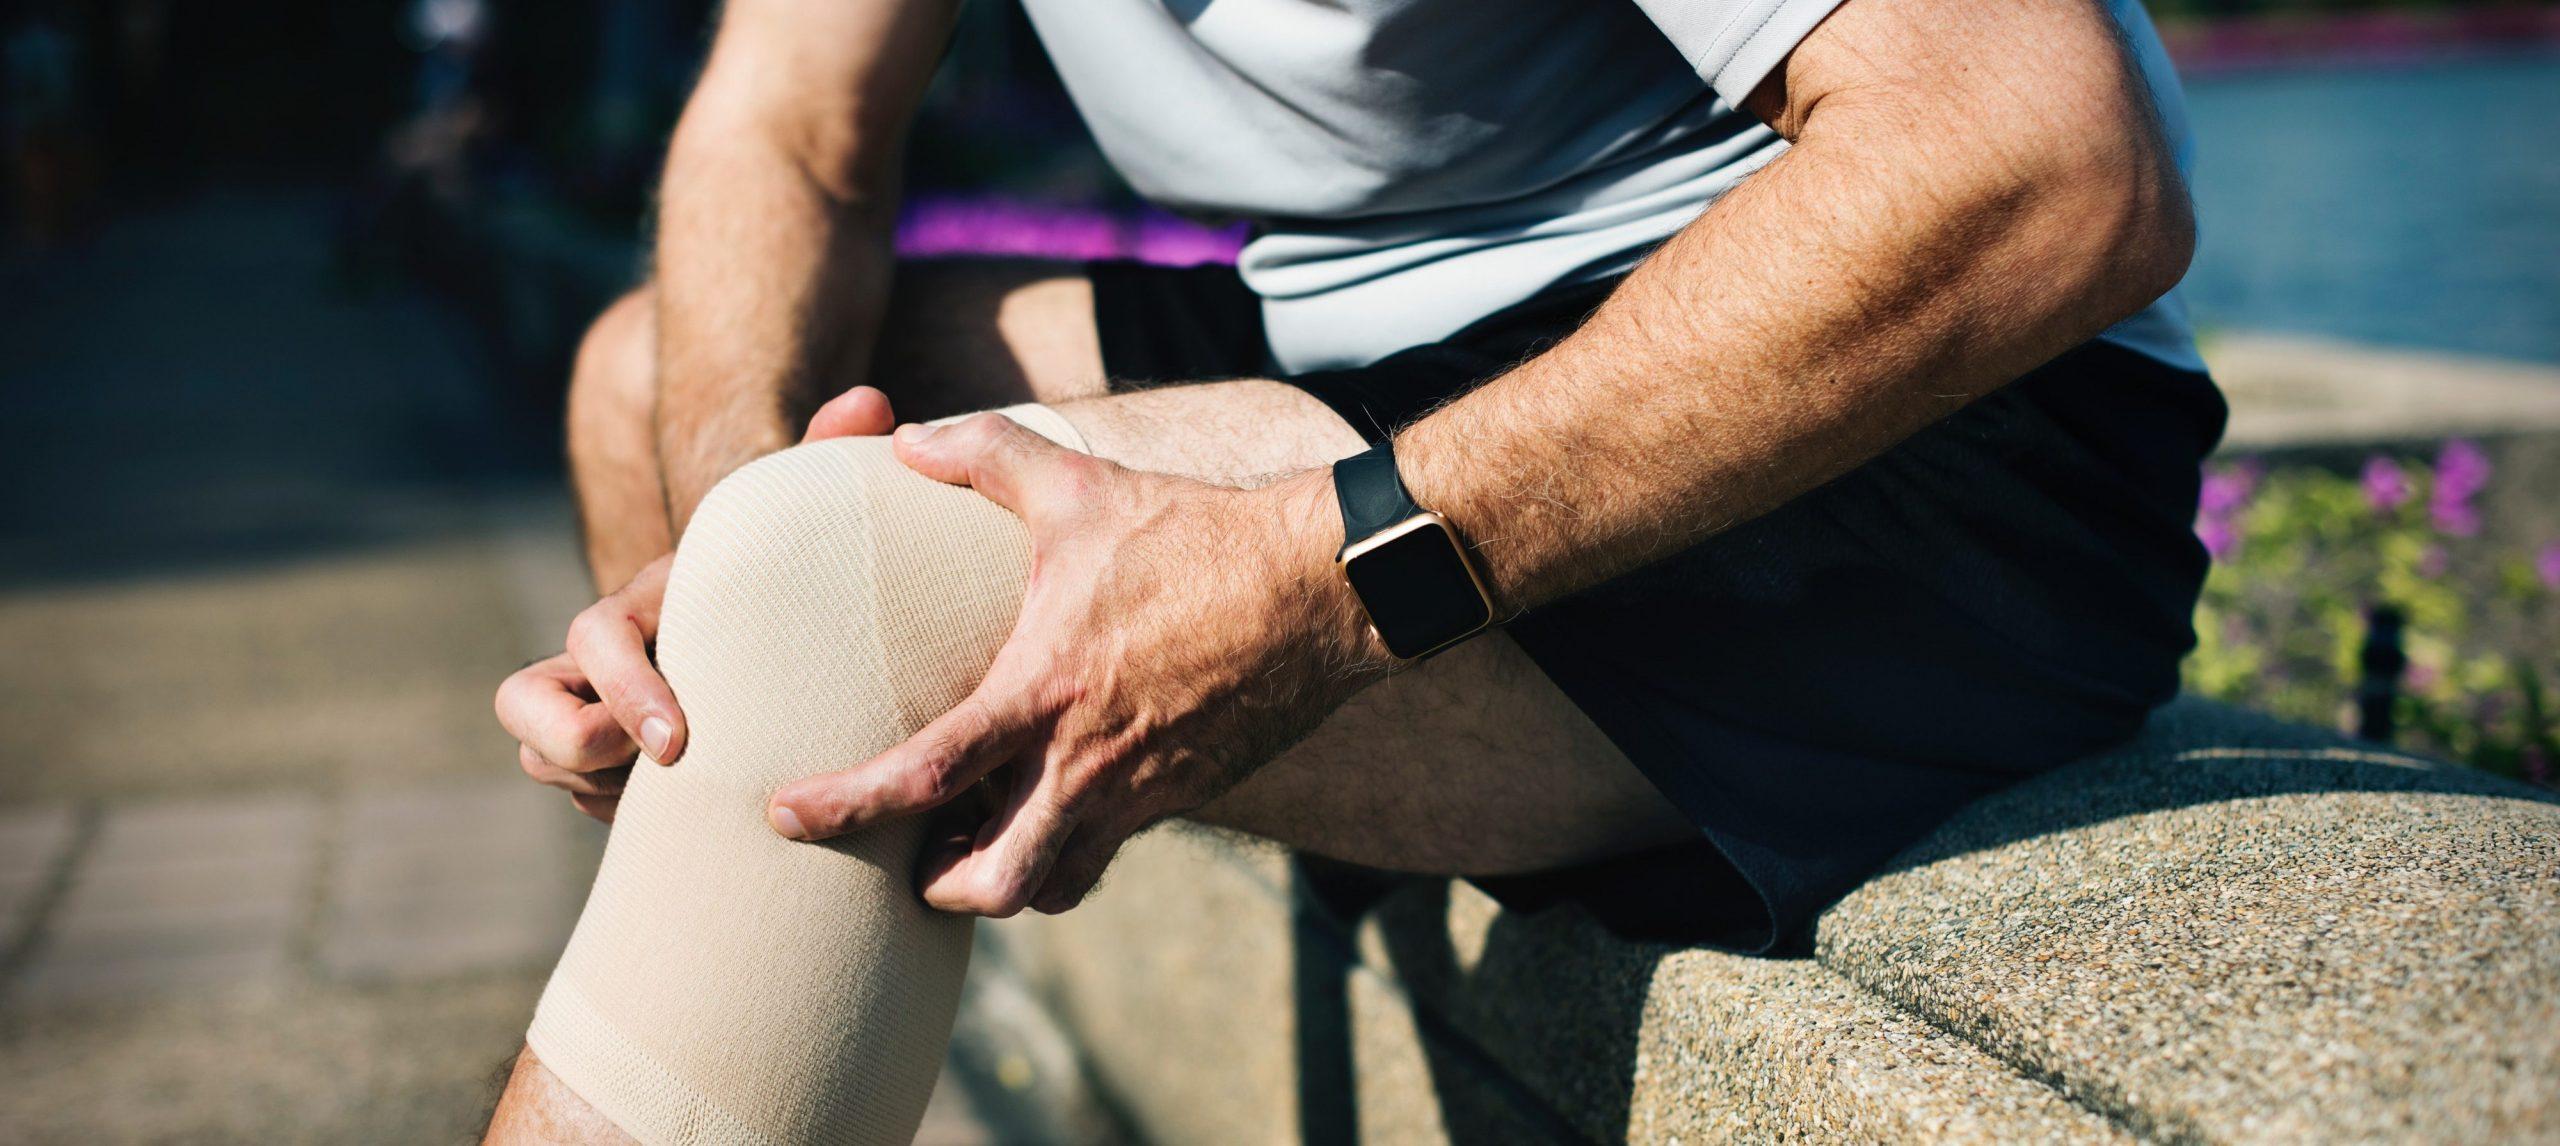 dor, joelho, artrite